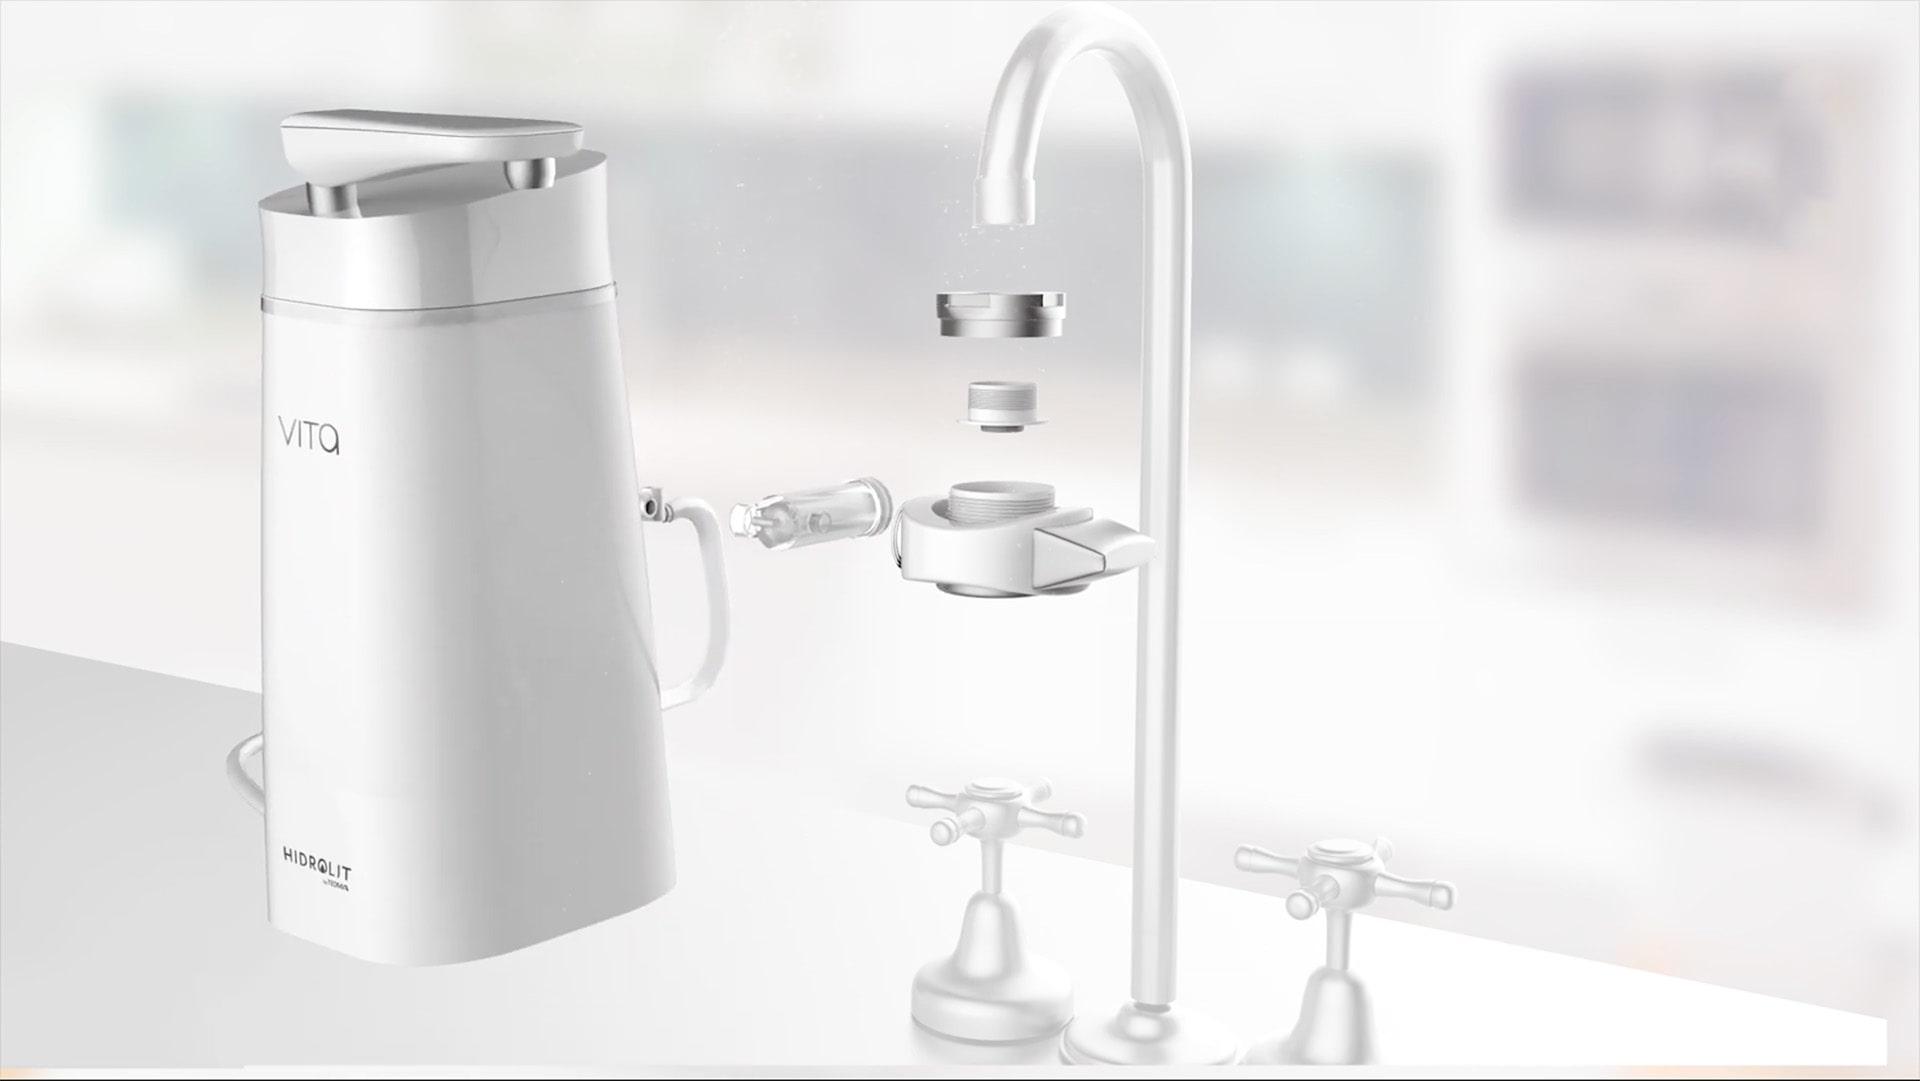 Purificador de agua hidrolit vita by teoma que genera agua alcalina instantáneamente